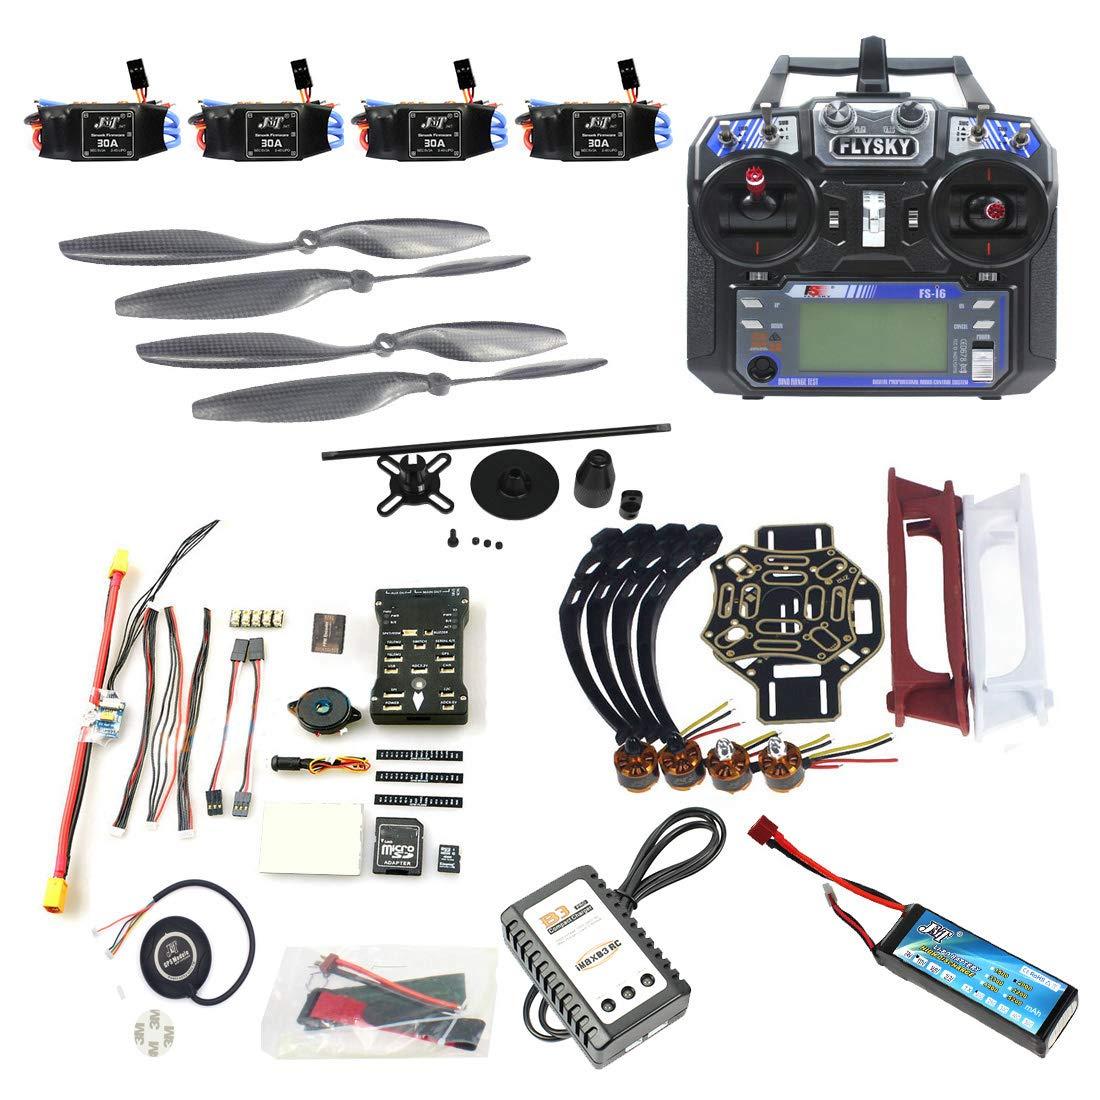 FEICHAO DIY FPV Drone Aircraft Kit Quadcopter 4 Assi 450 Frame PXI PX4 Flight Control 920KV Motore GPS FS-i6 Trasmettitore